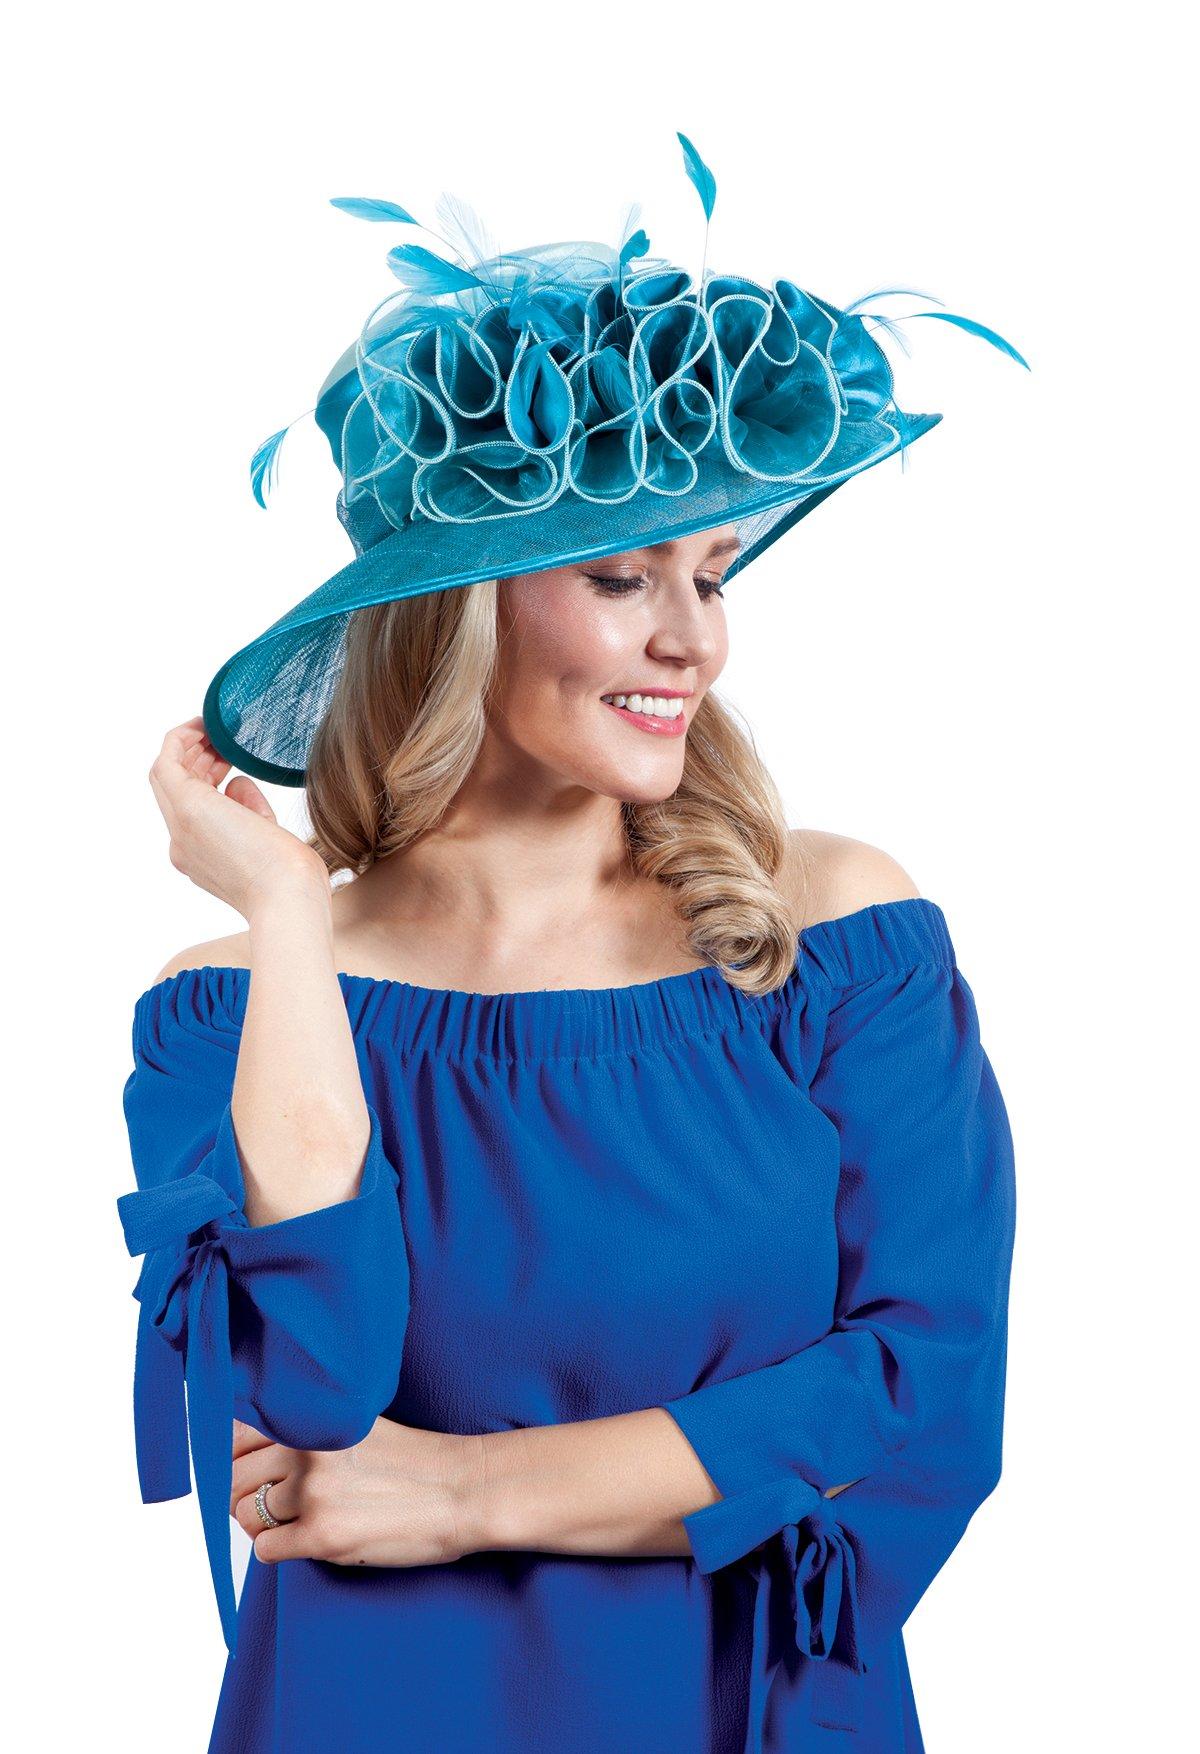 ChicHeadwear Womens Wide Brim Bow Sinamay Fashion Hat - Silver w/Charcoal by ChicHeadwear (Image #2)